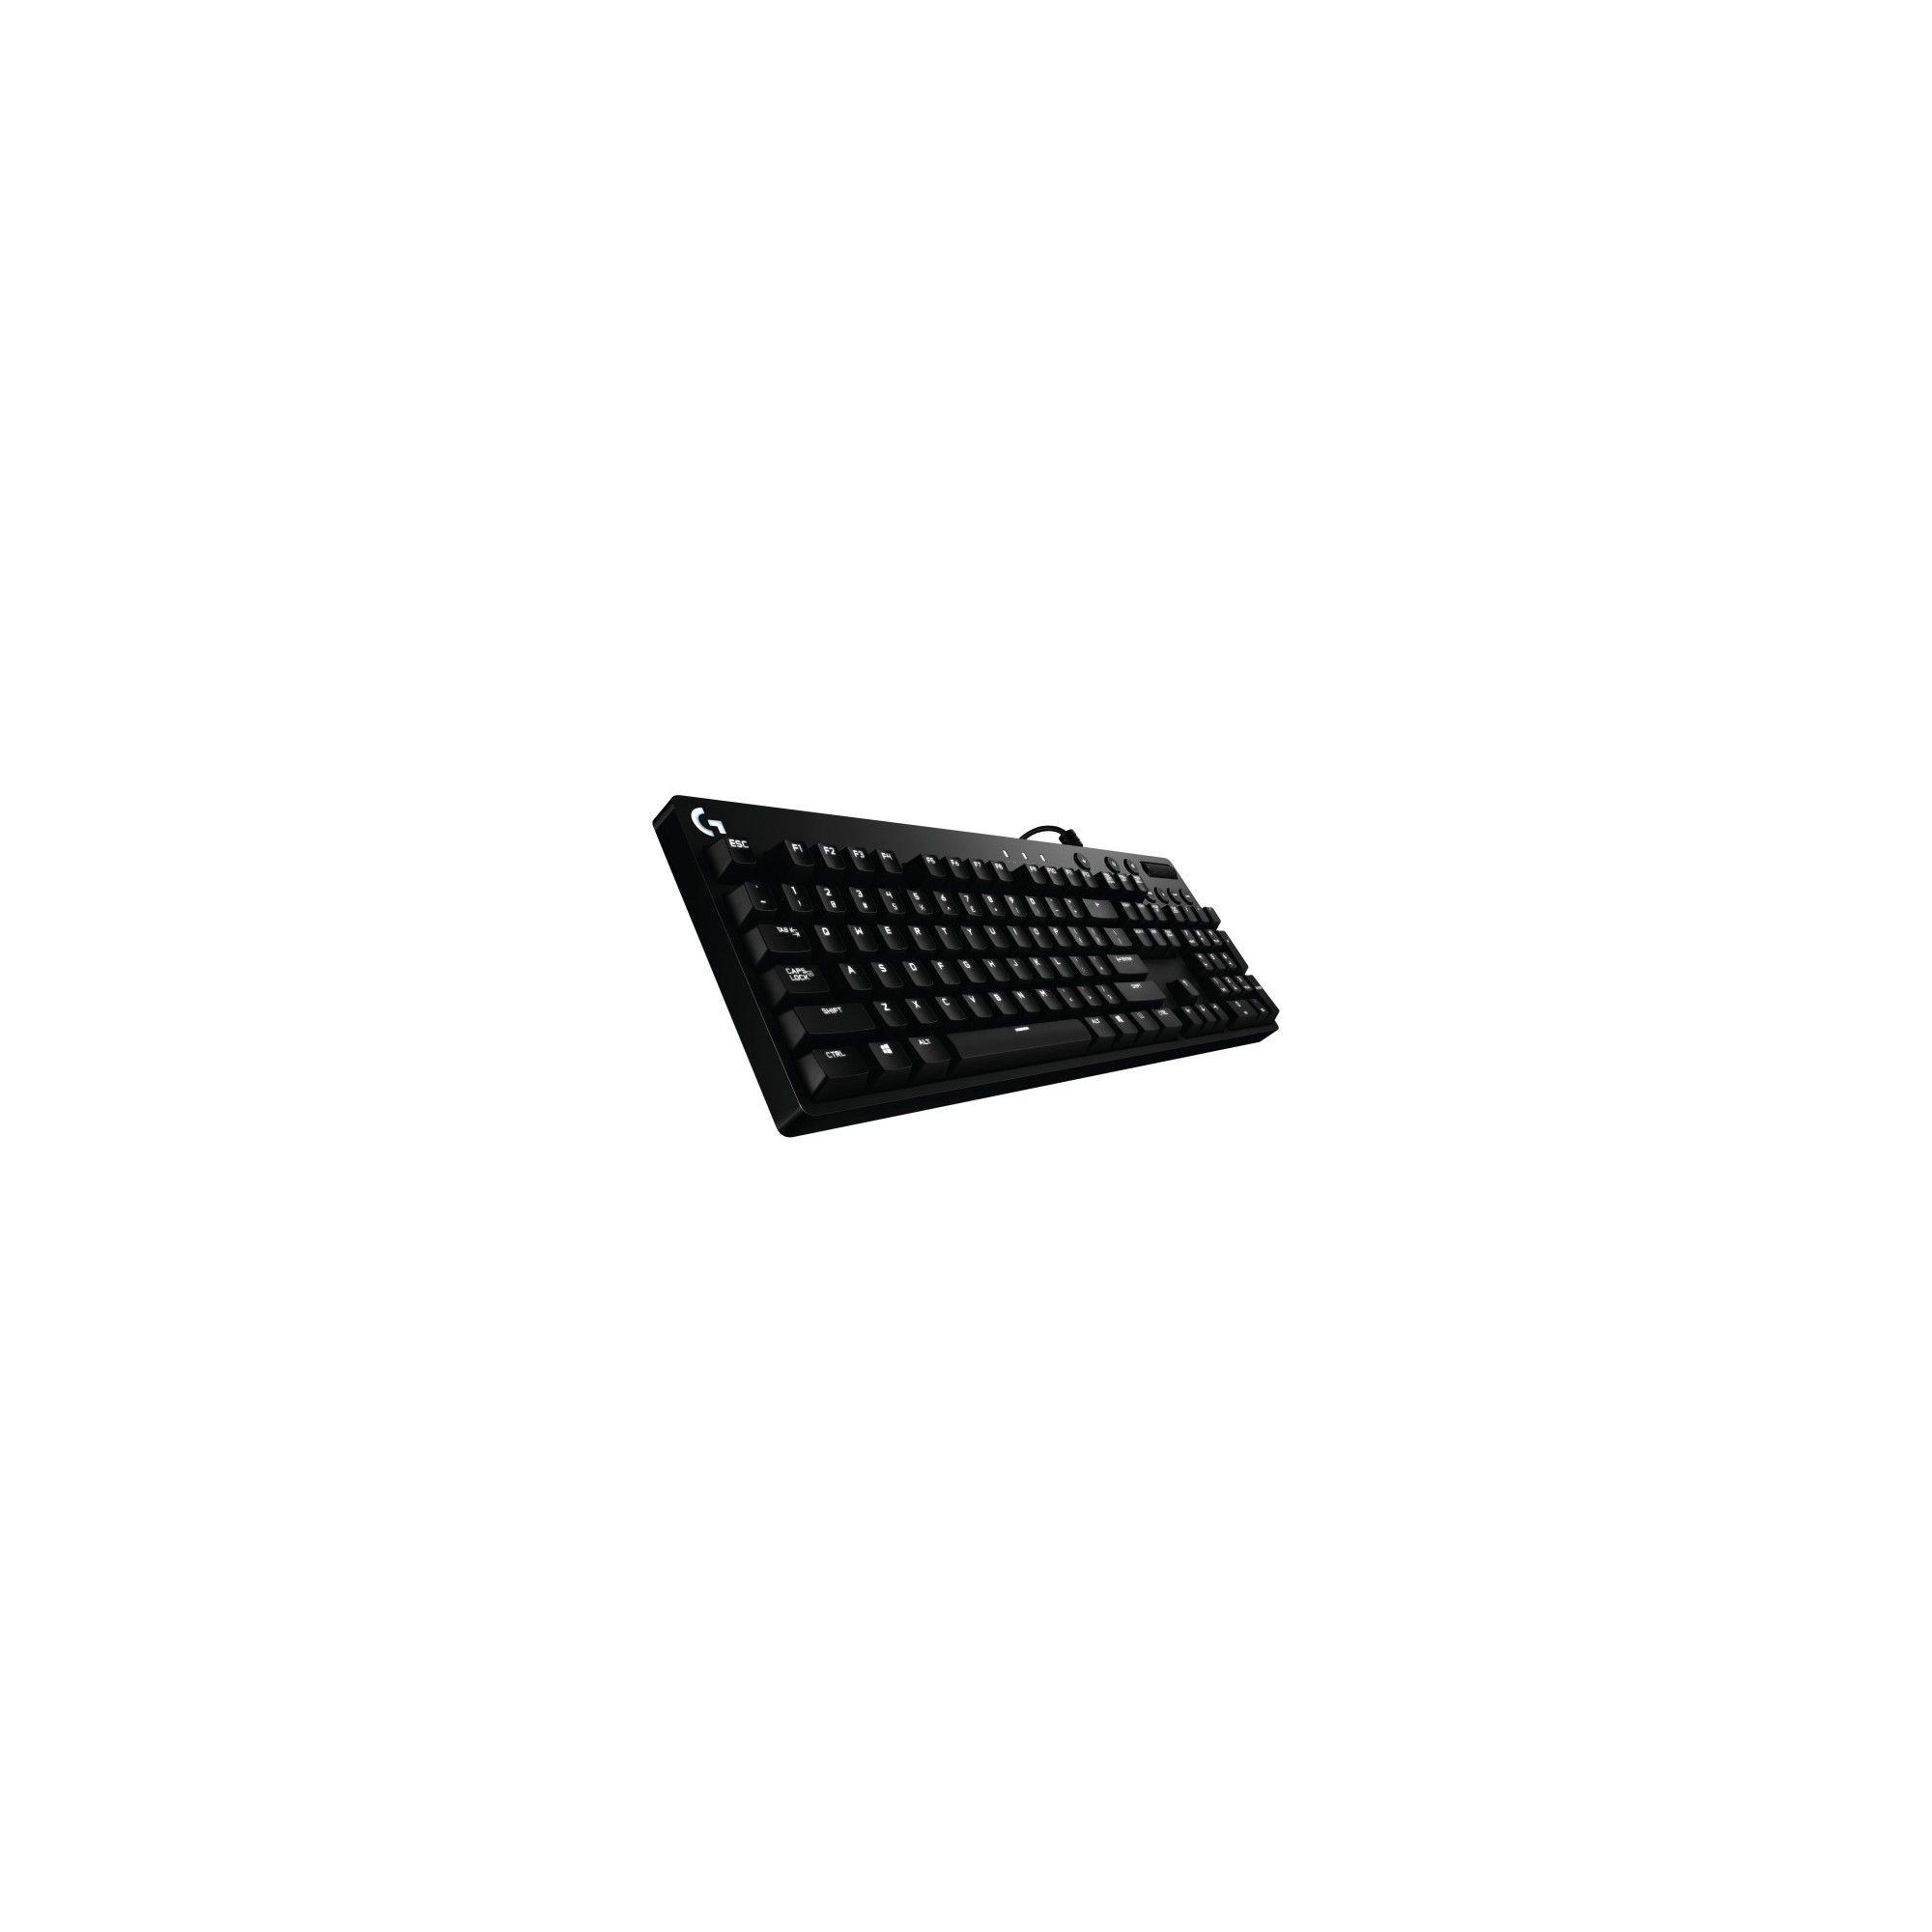 5b2349c4876 Logitech G610 Orion Red Backlit Mechanical Gaming Keyboard in 2019 ...